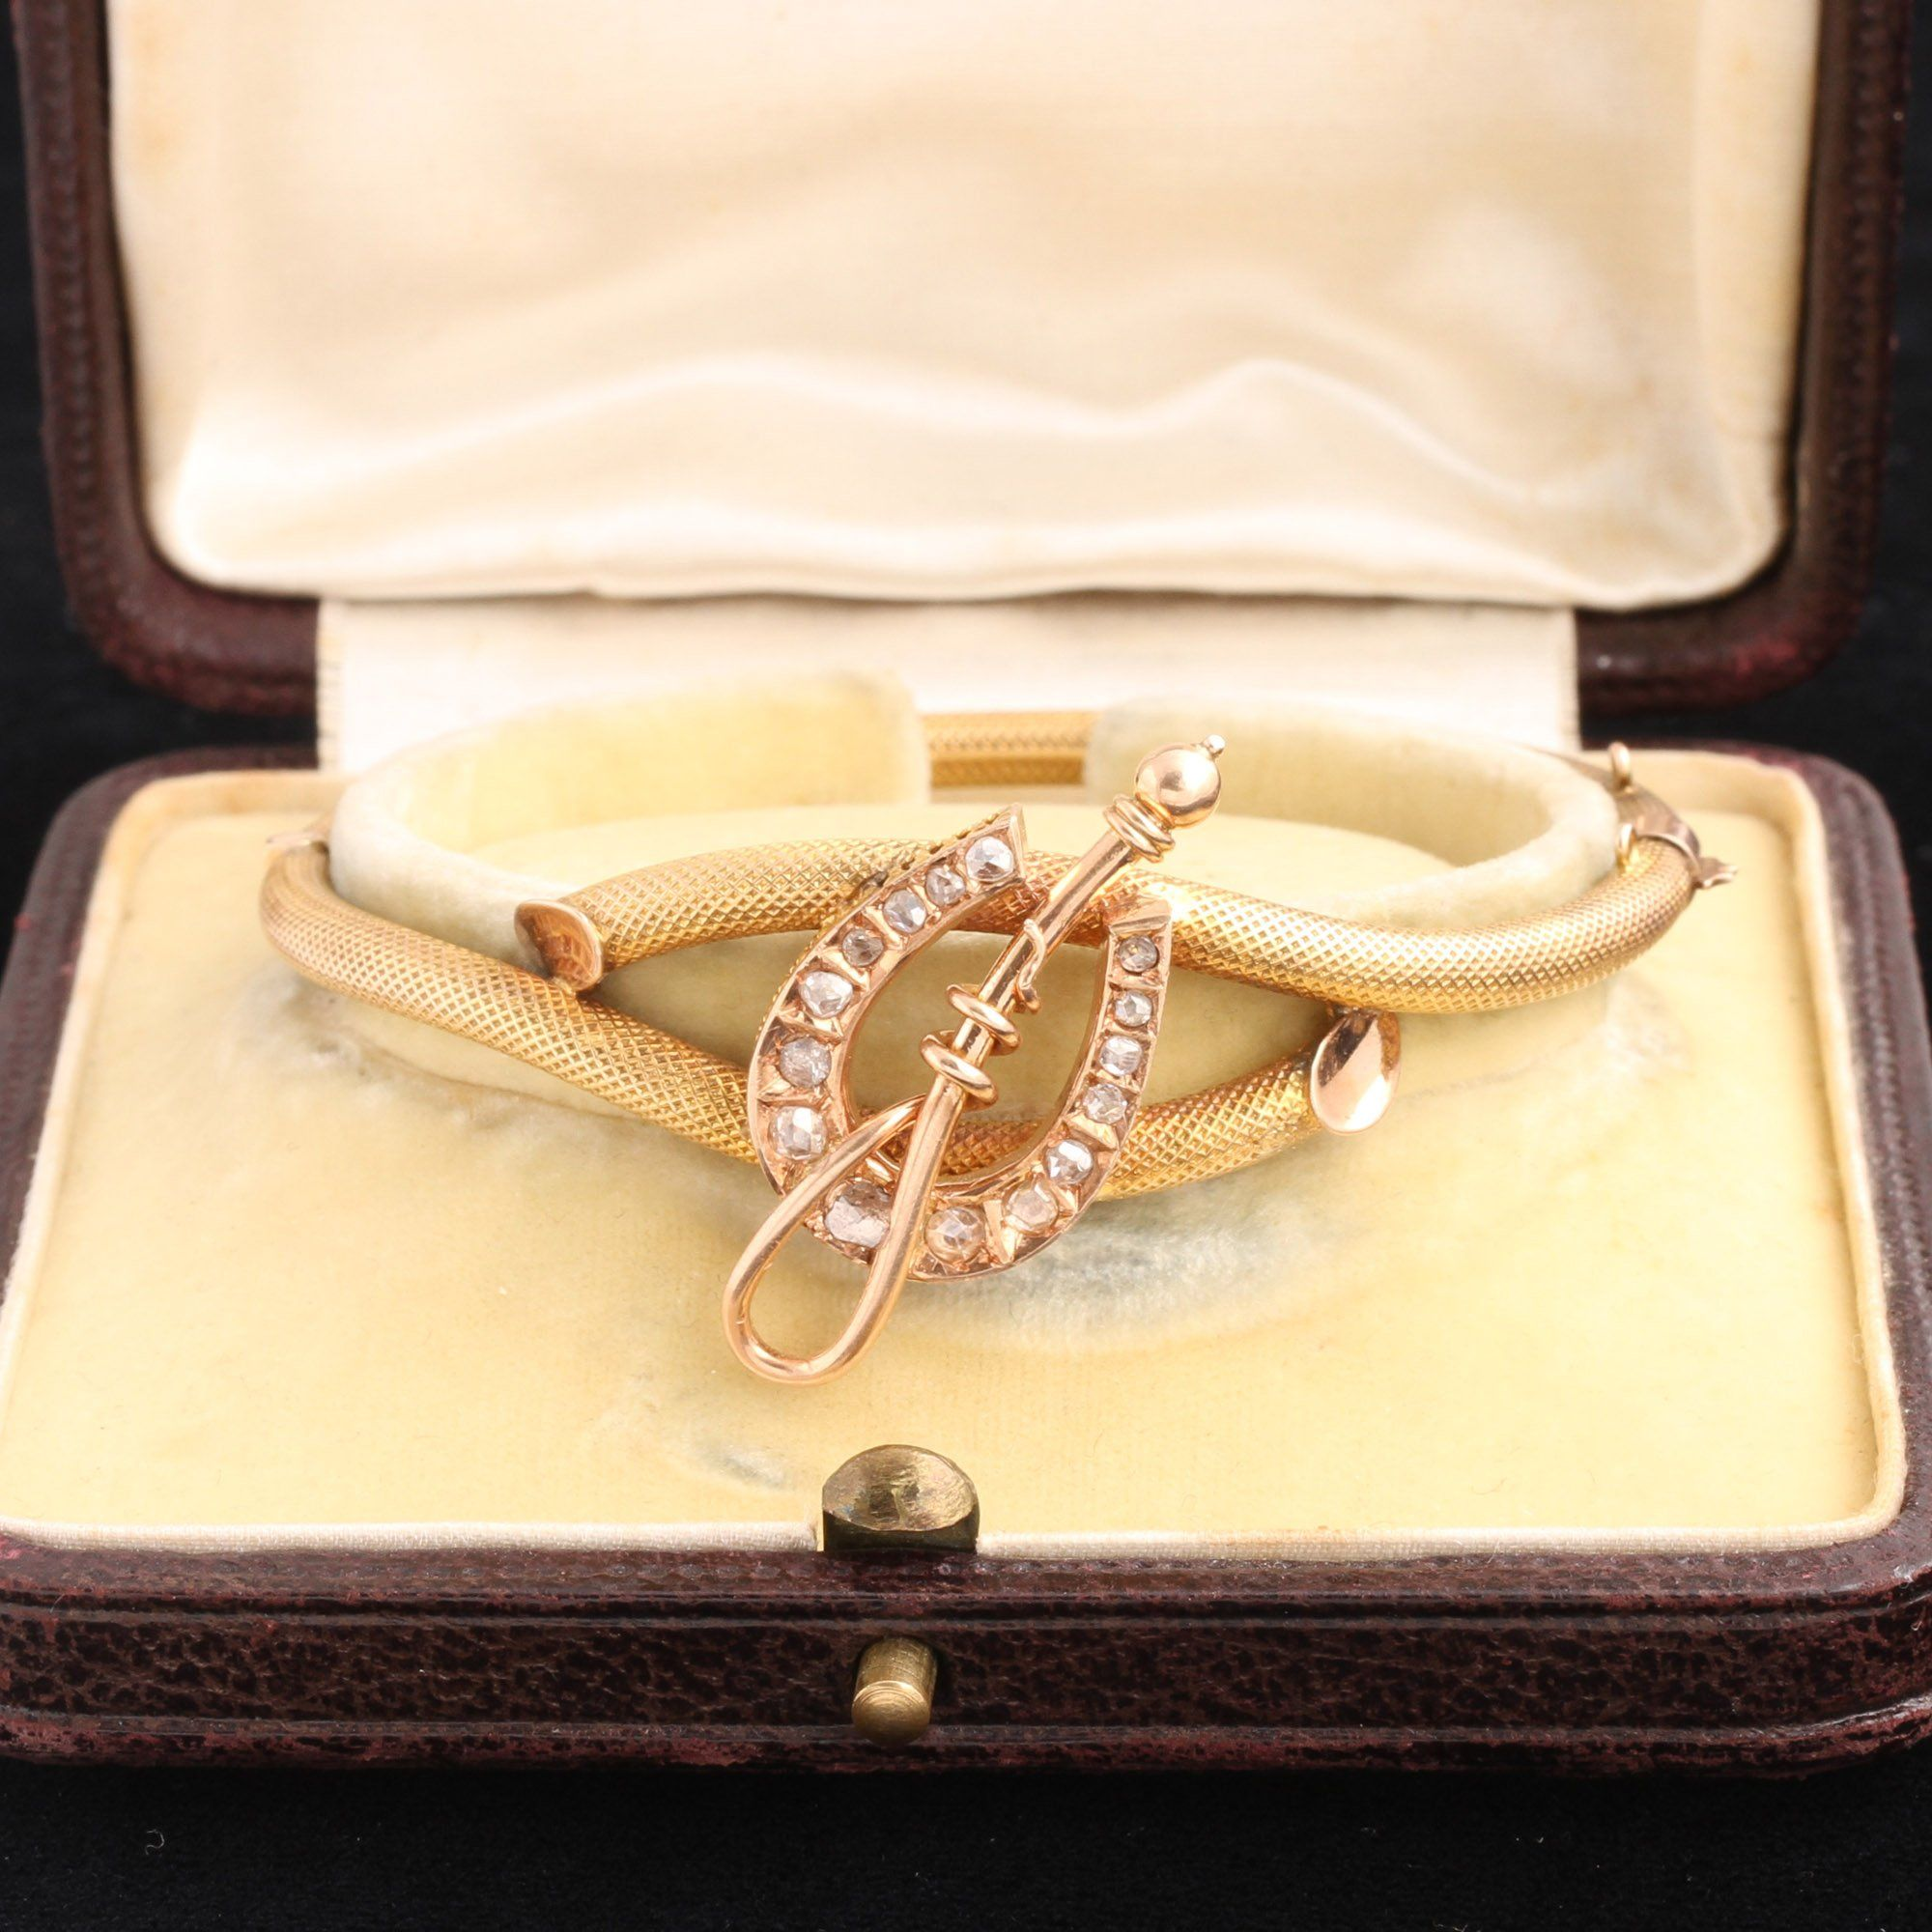 Late 19th Century French Equestrian Diamond Bangle